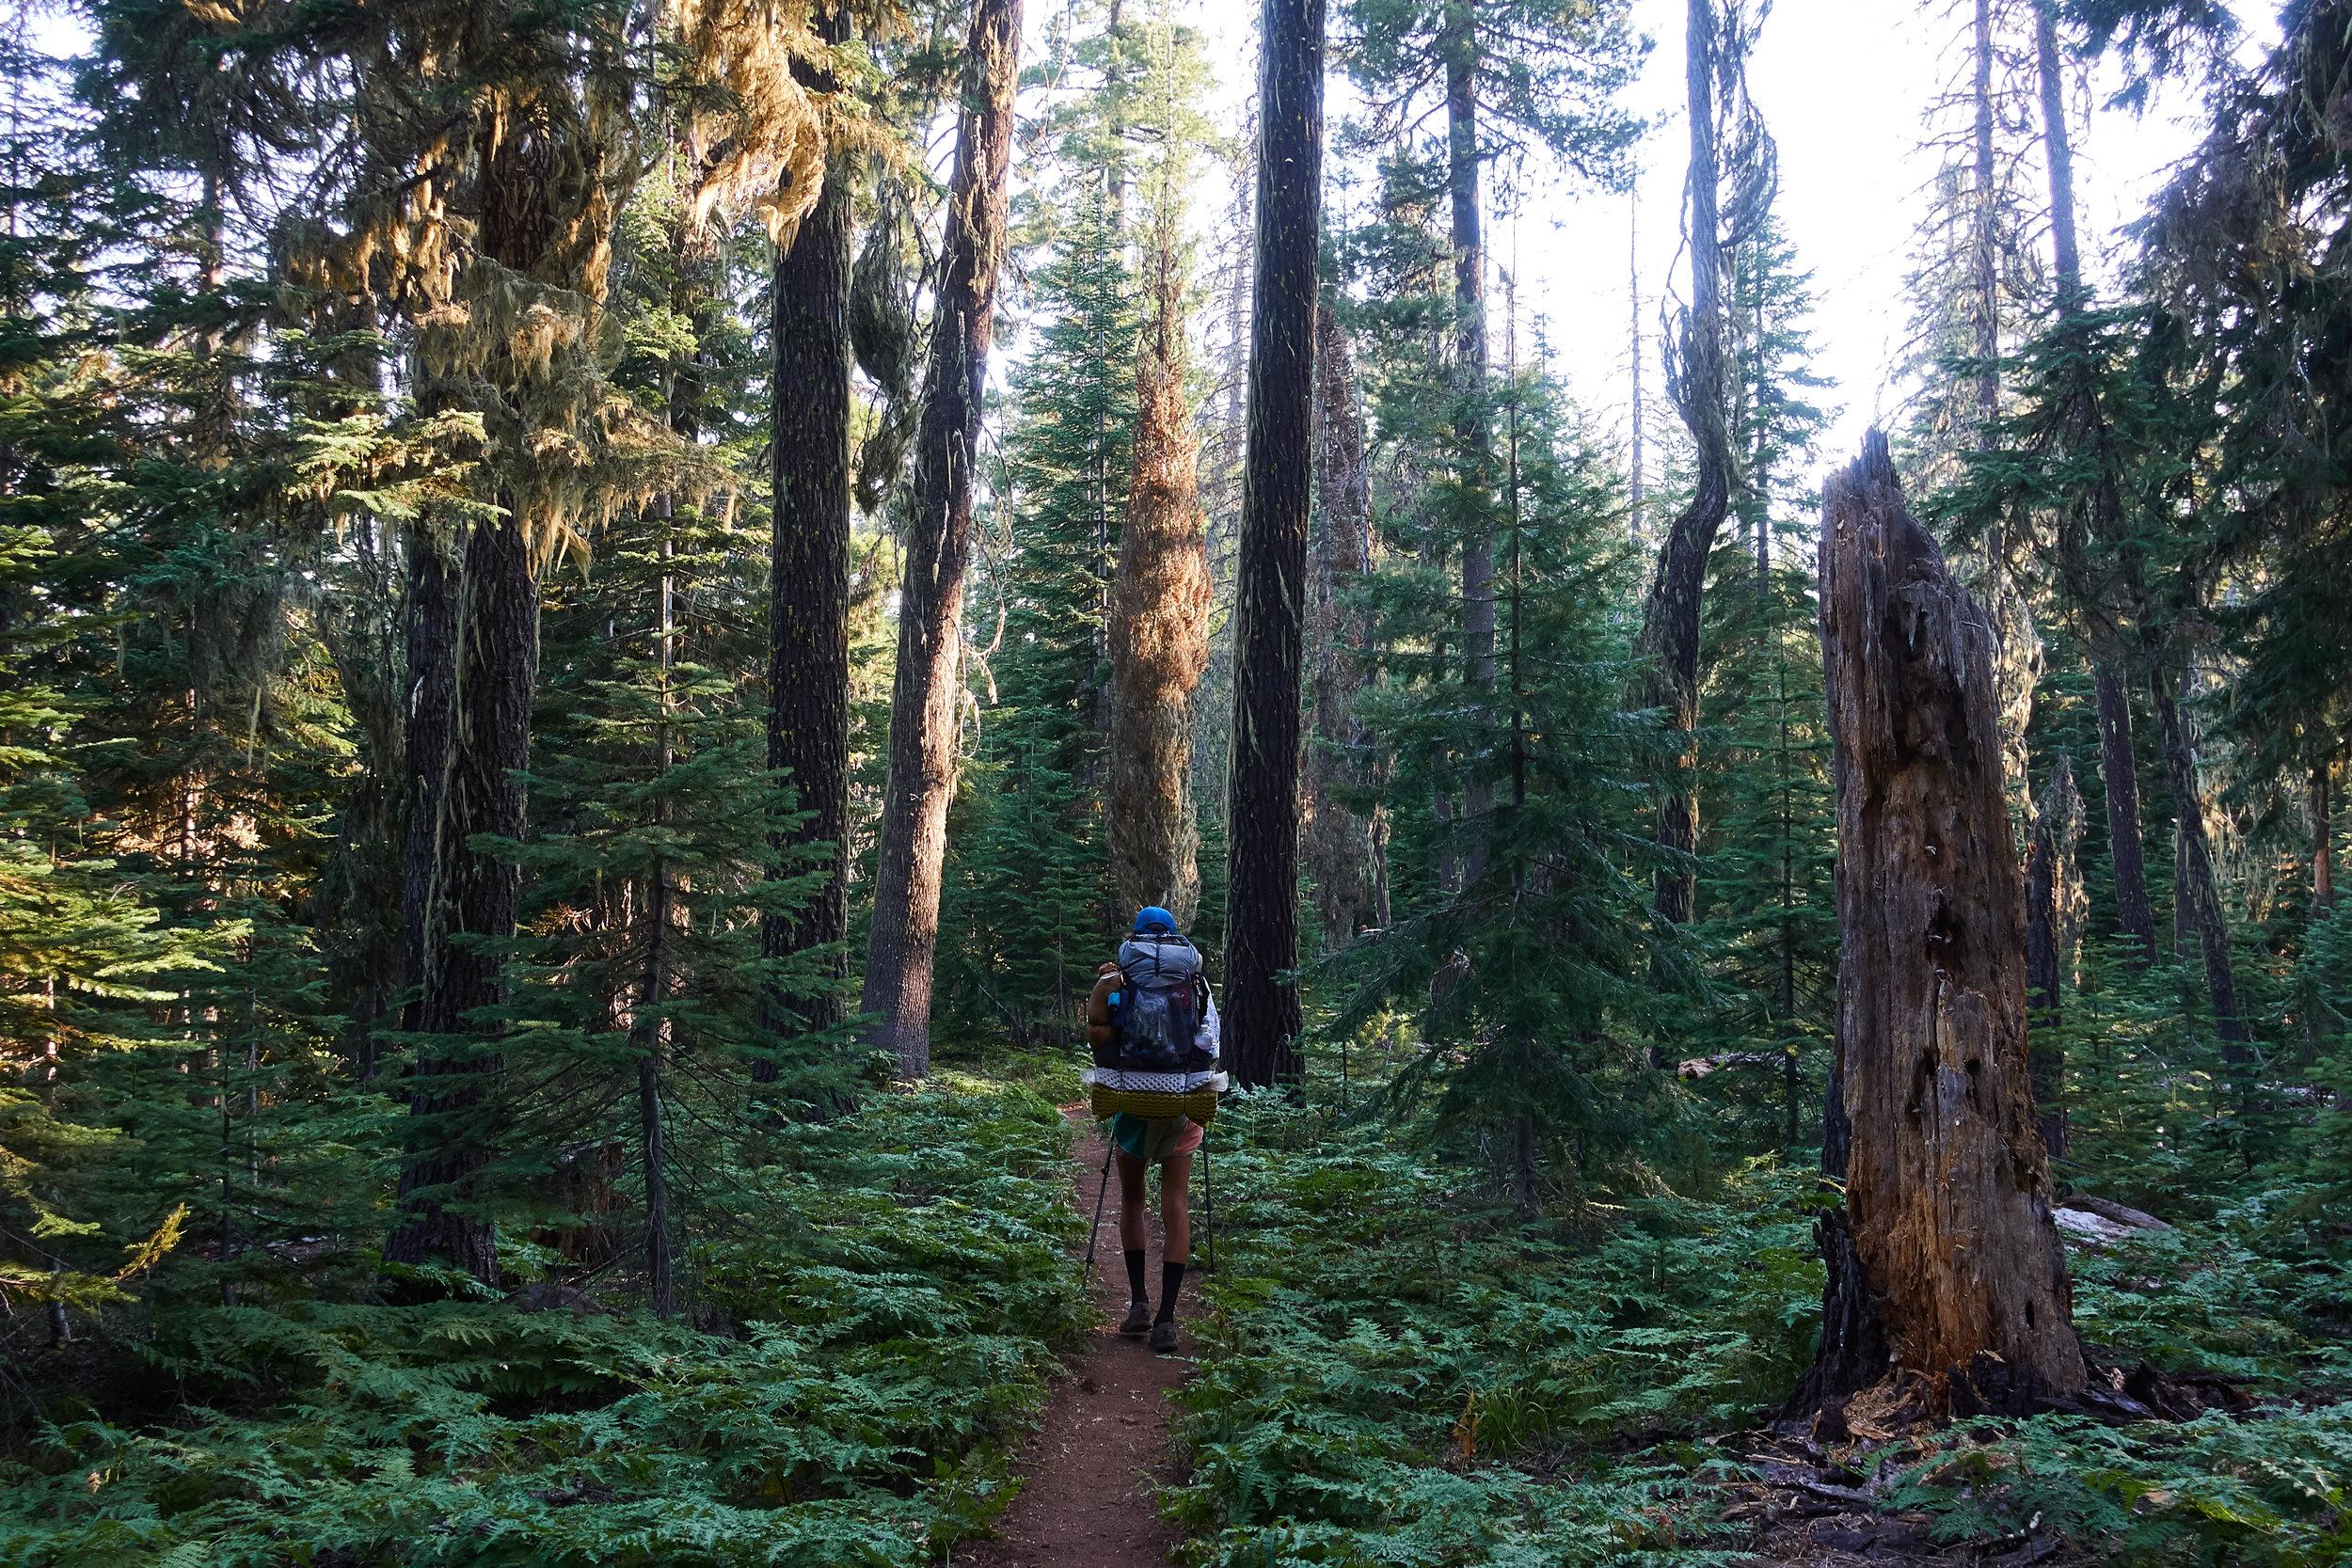 Morning walk through the woods.